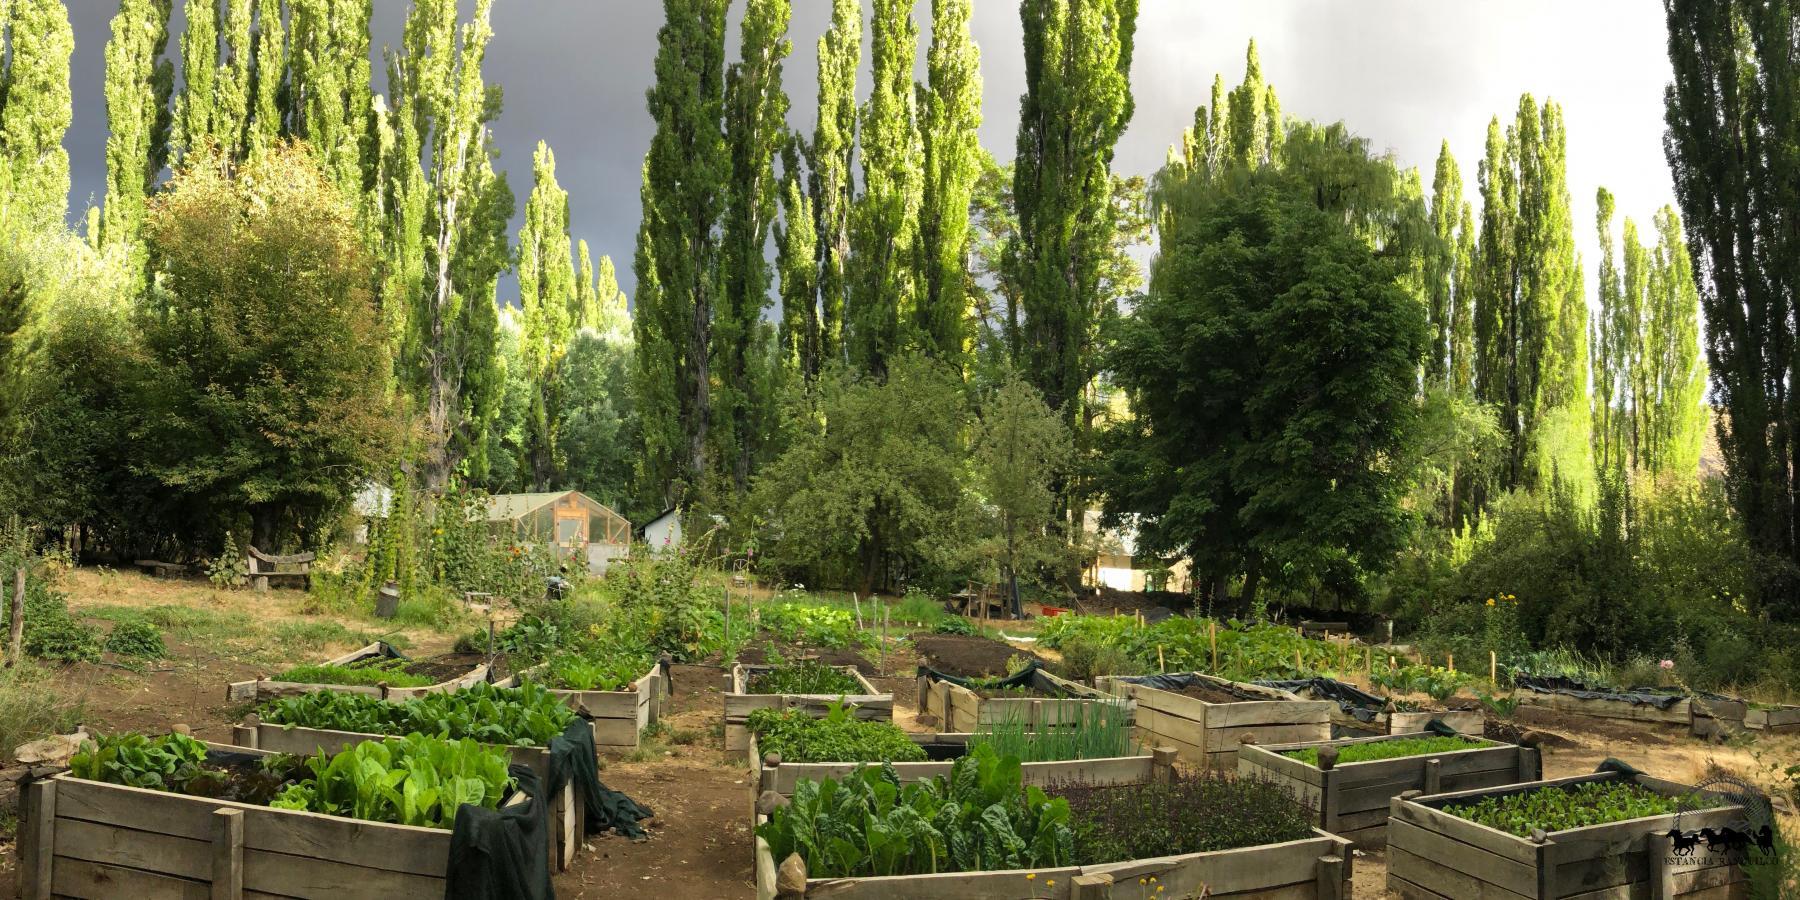 Estancia Ranquilco's organic garden supplies fresh produce to Ranquilco kitchens every day